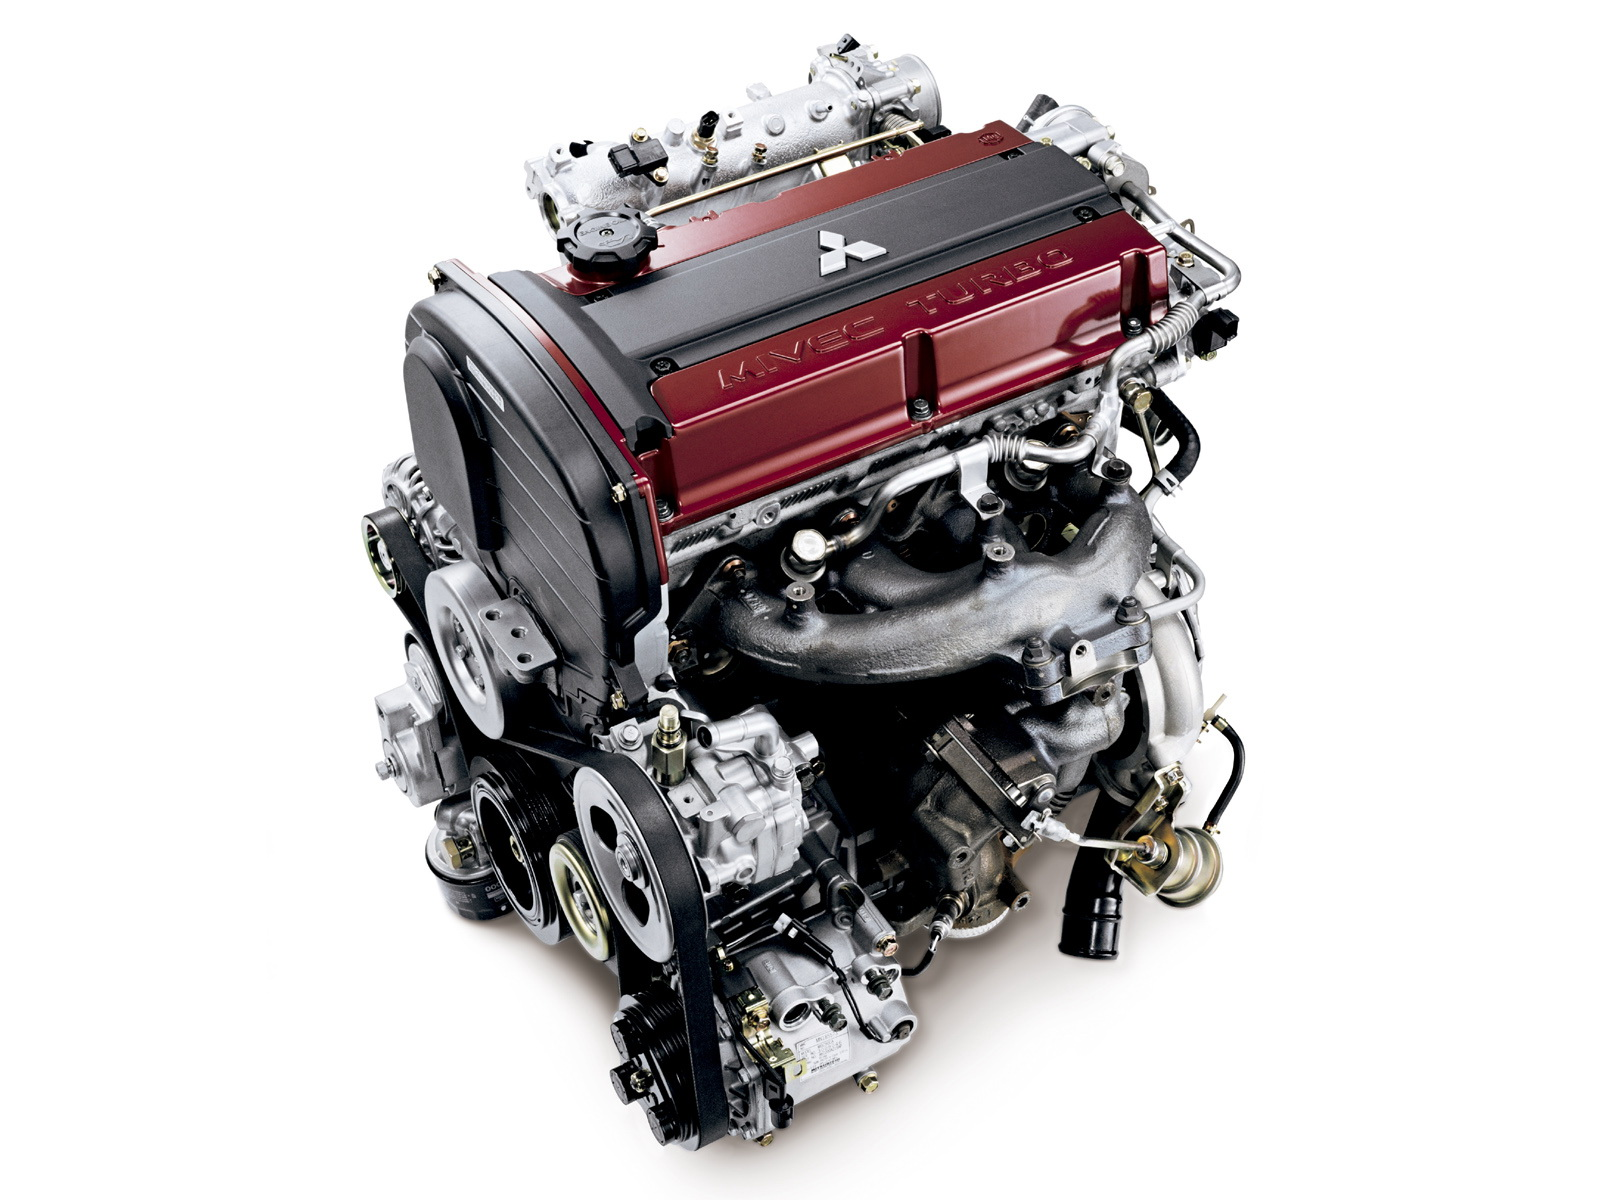 336. Mechanika #03: Silniki Mitsubishi - 4G63T & 4B11T. staryjaponiec blog